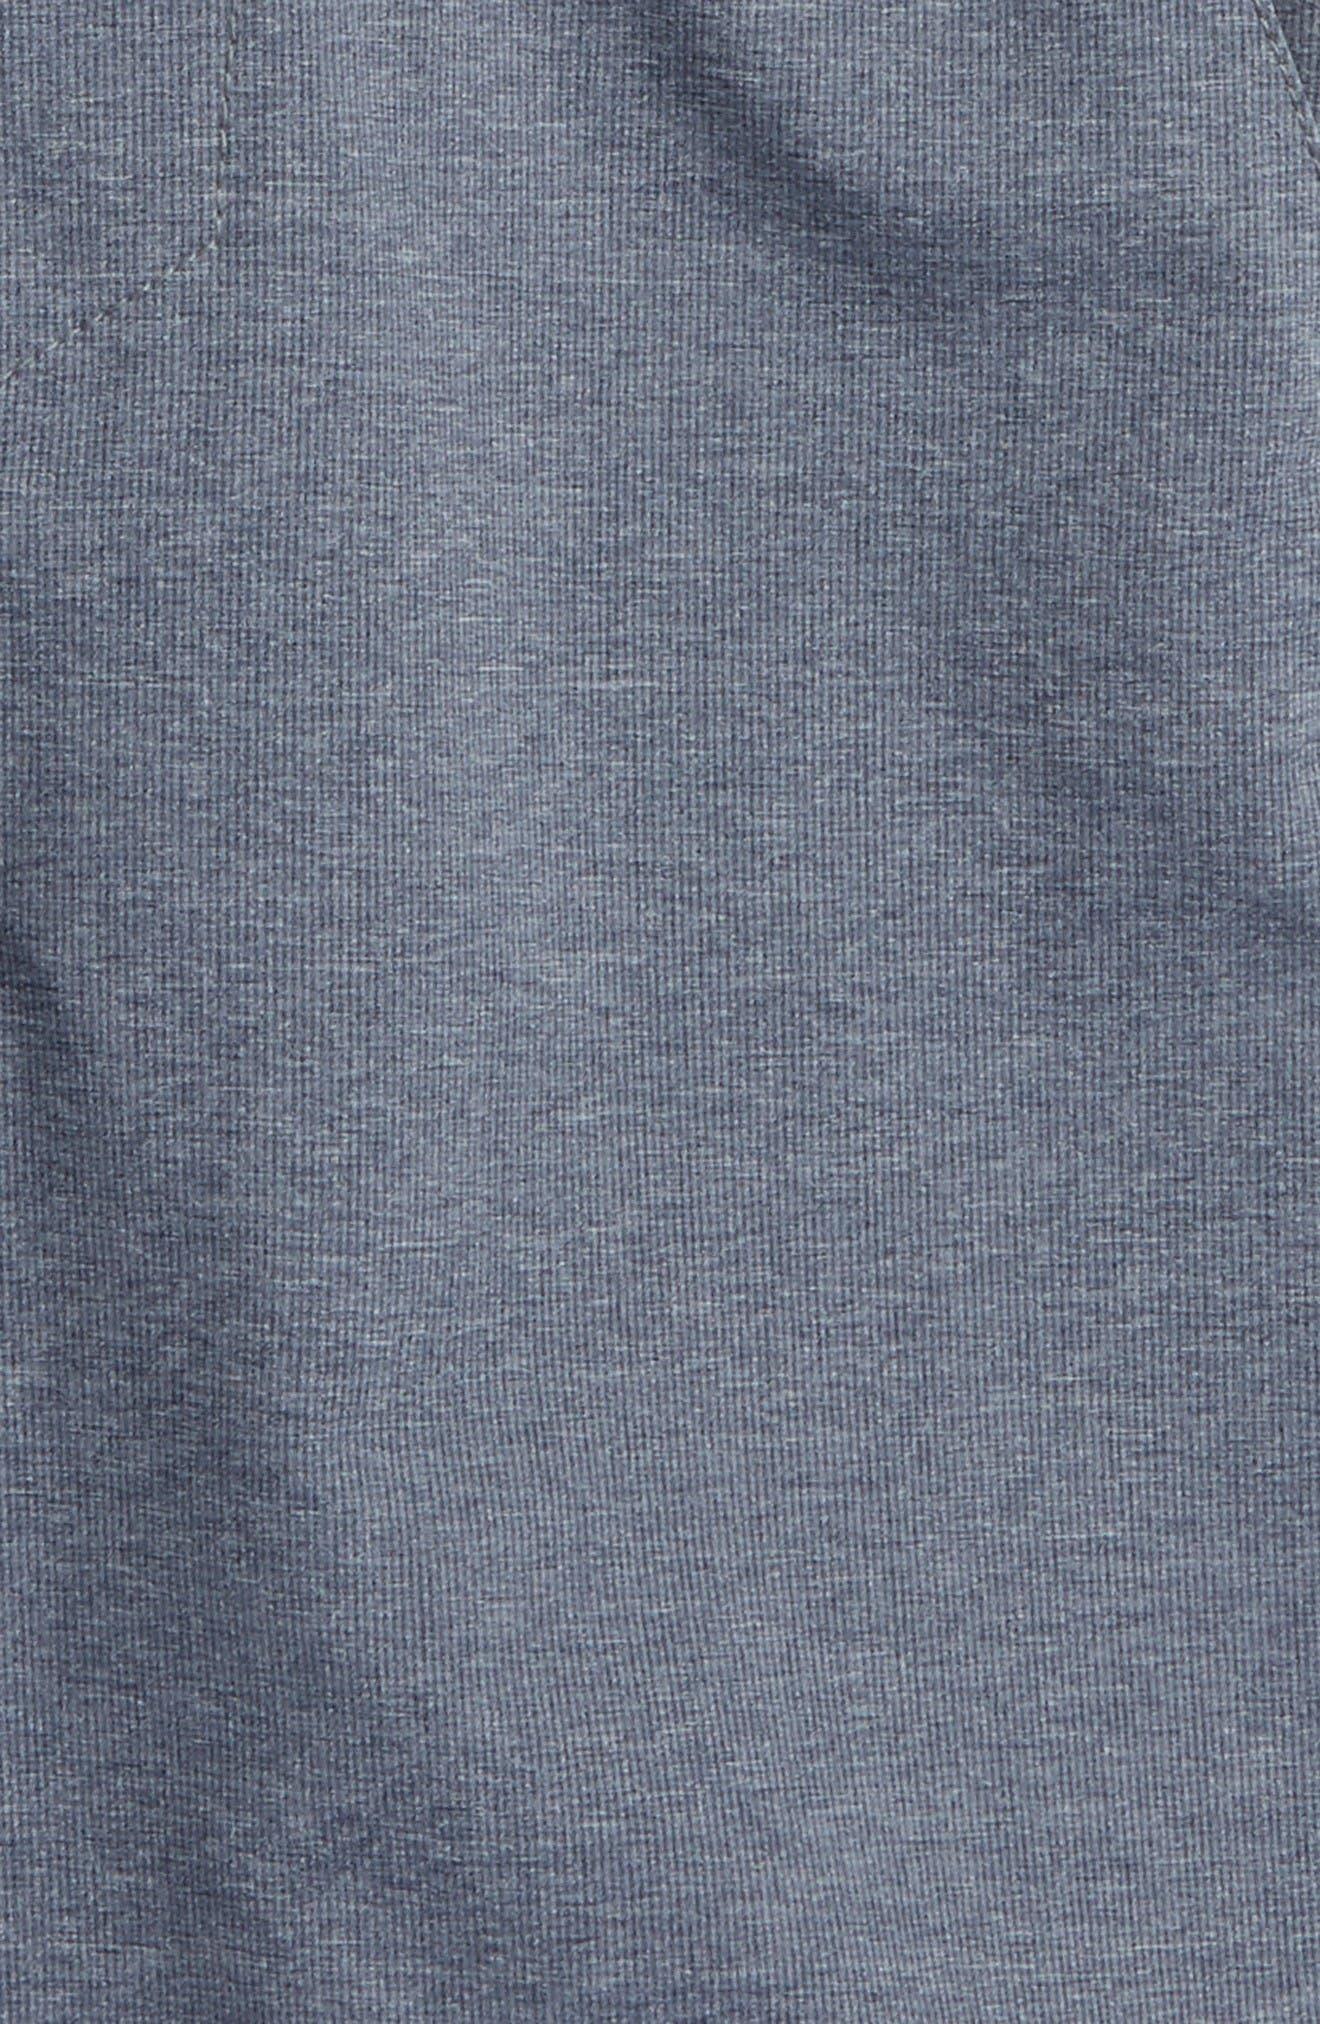 Alternate Image 2  - Rip Curl Omaha Hybrid Board Shorts (Toddler Boys & Little Boys)